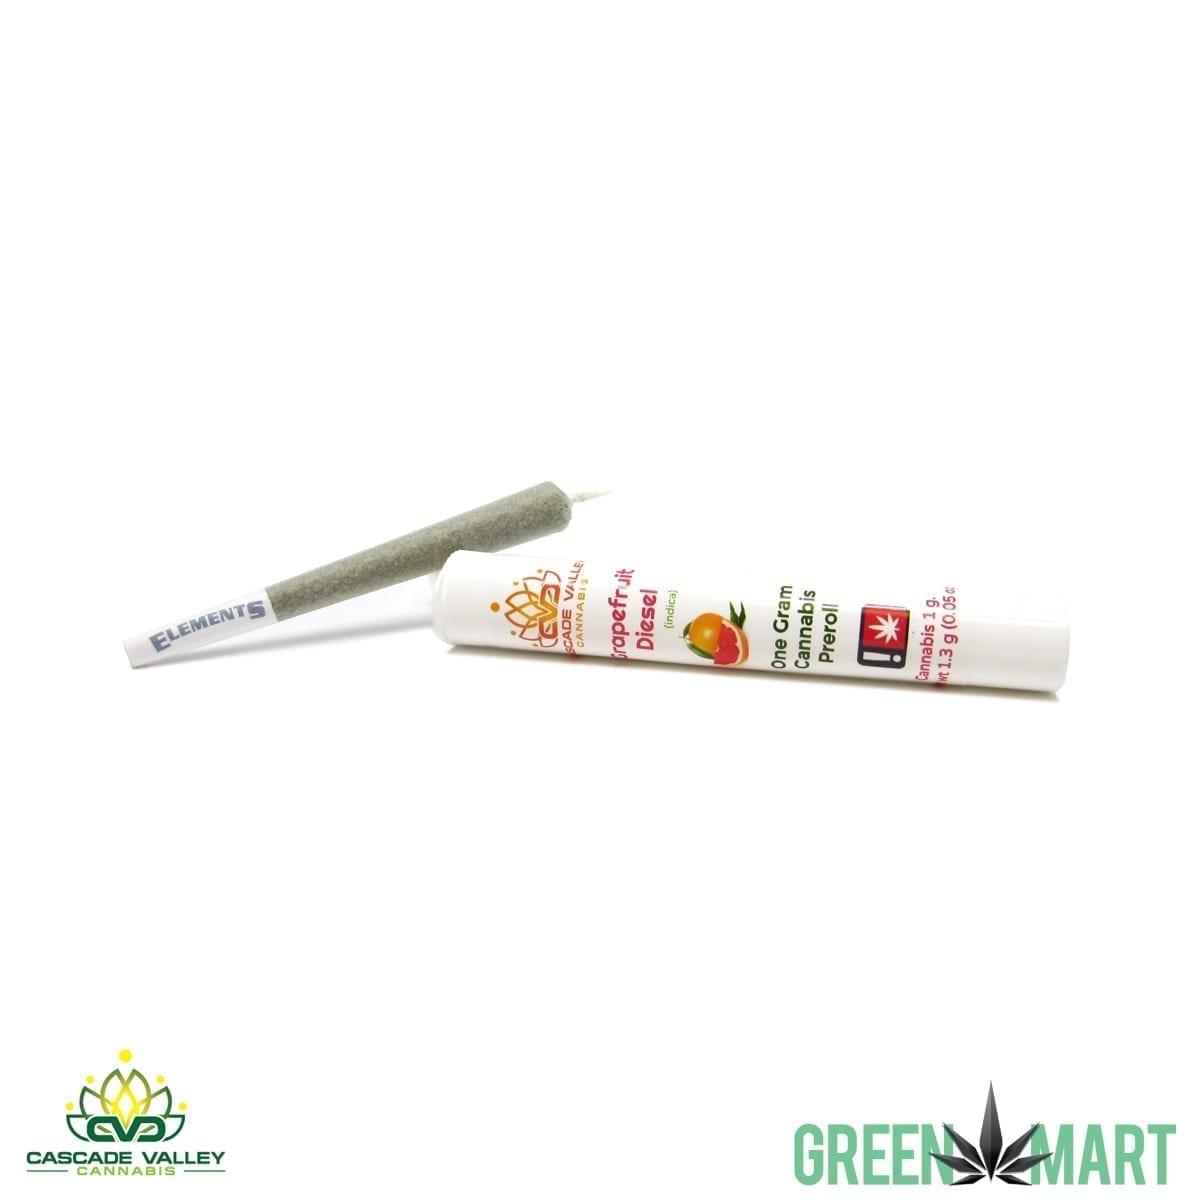 Cascade Valley Cannabis 1g Pre-roll - GrapefruitDiesel